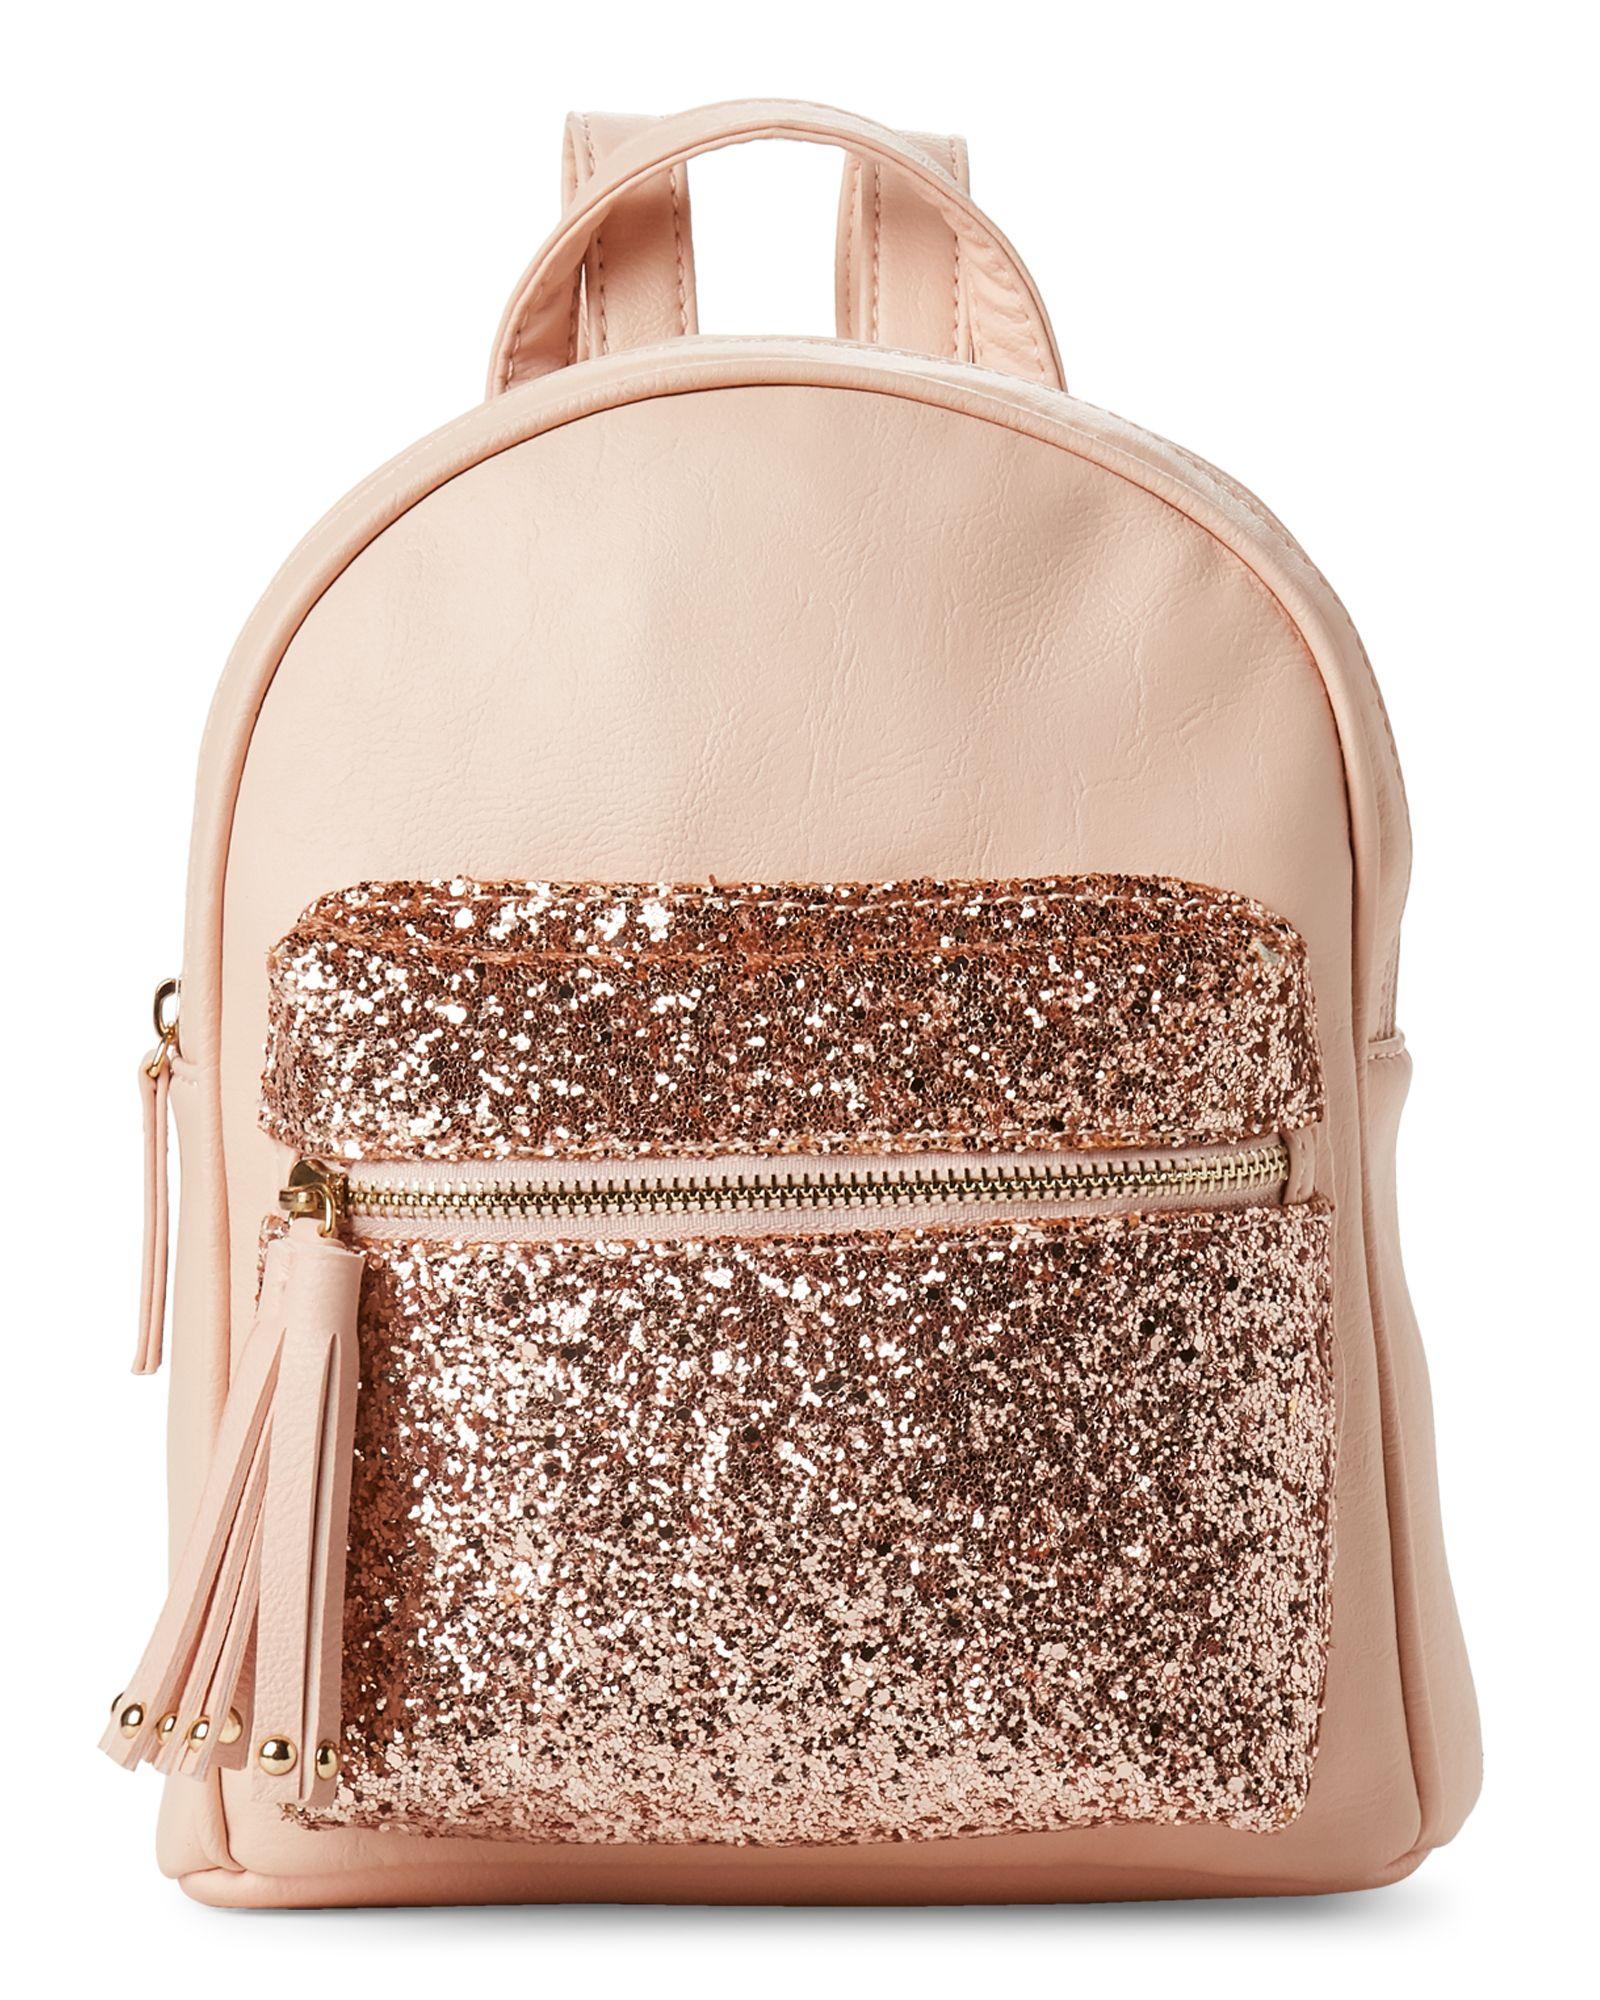 618bd4fc3f10d Omg! Accessories Rose Gold Tasseled Glitter Pocket Mini Backpack ...